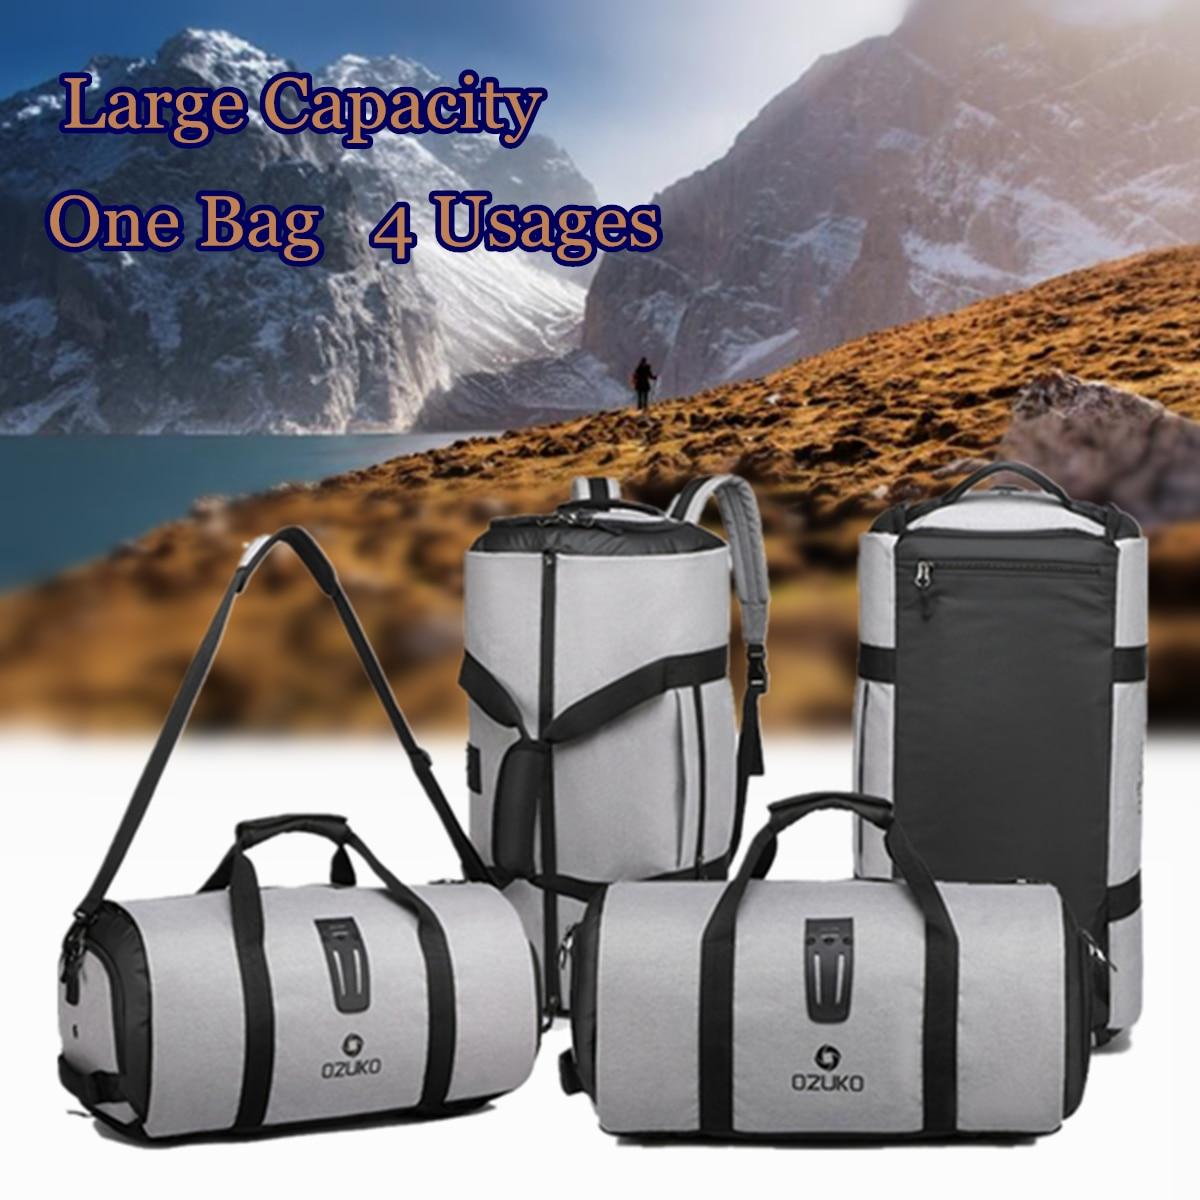 2 In 1 Travel Bag Mens Garment Bags Women Waterproof Travel Shoulder Bag Large Luggage Duffel Totes Carry On Leisure Hand Bag